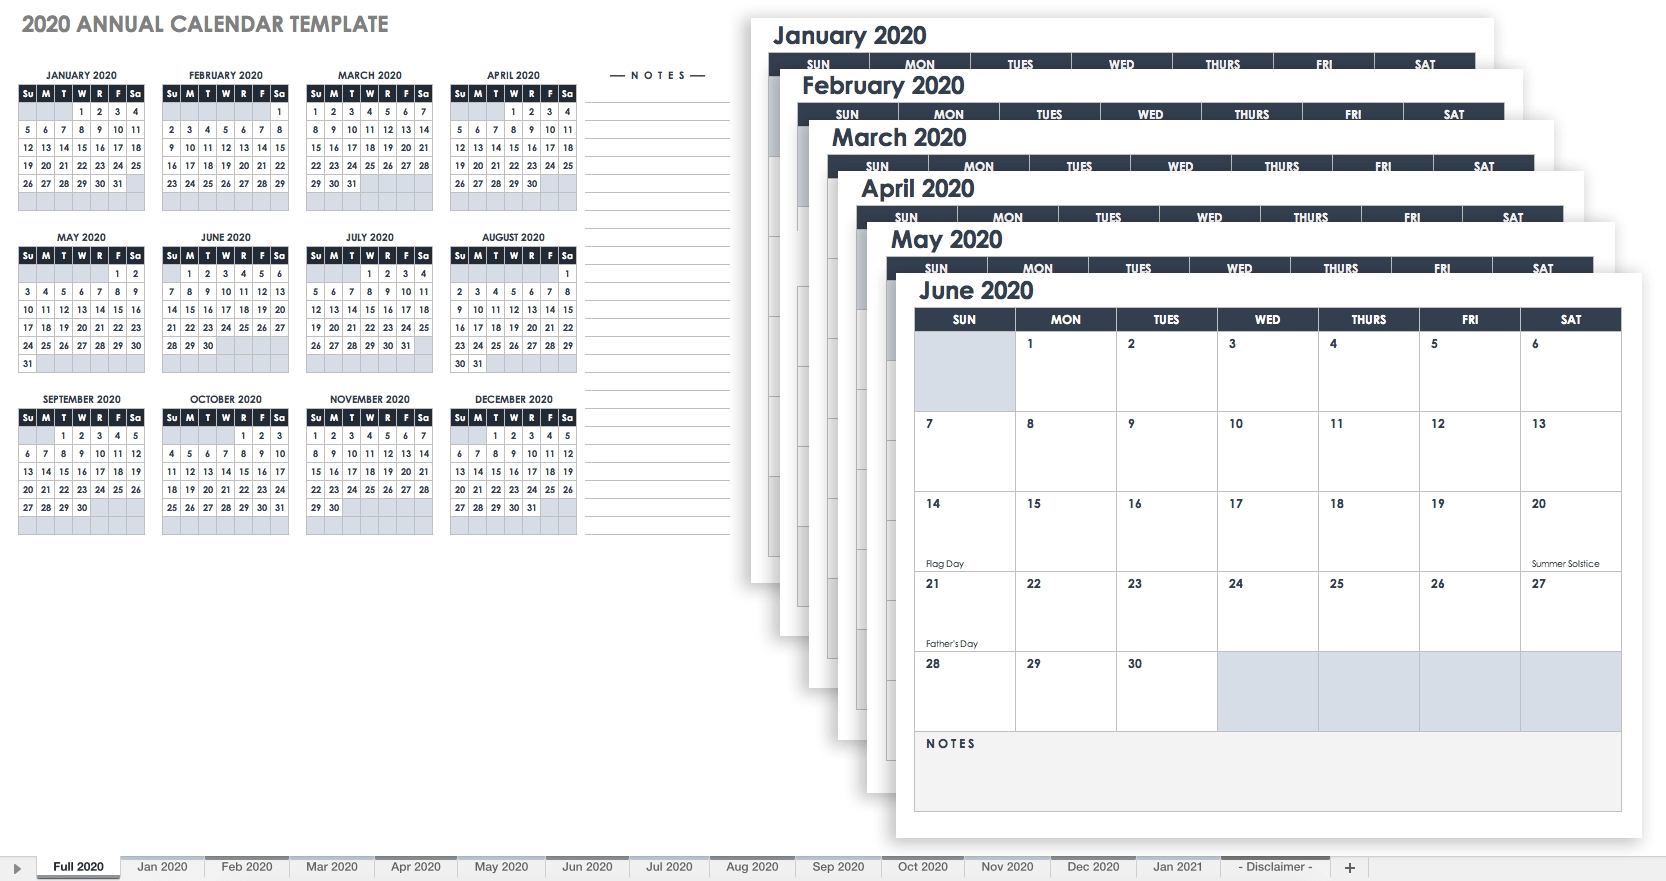 Free Blank Calendar Templates - Smartsheet_3 Month Blank Calendar 2020